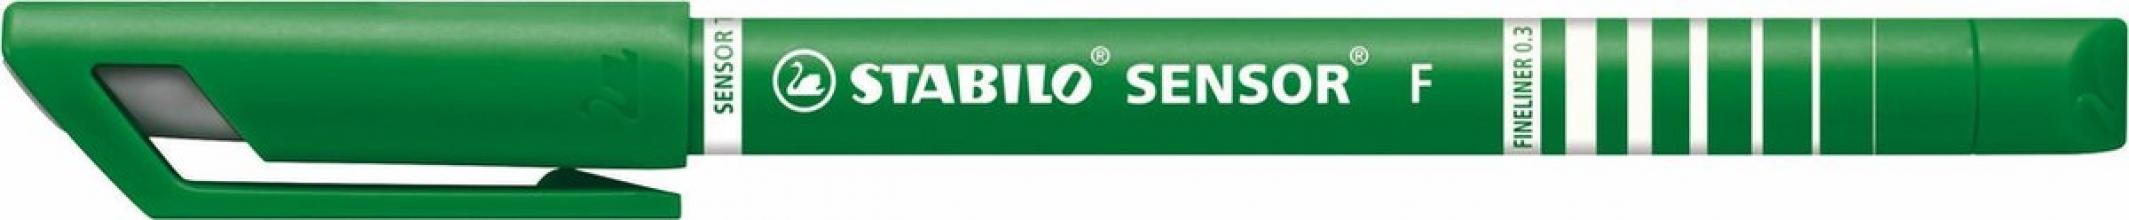 , Fineliner stabilo sensor 189/36 groen